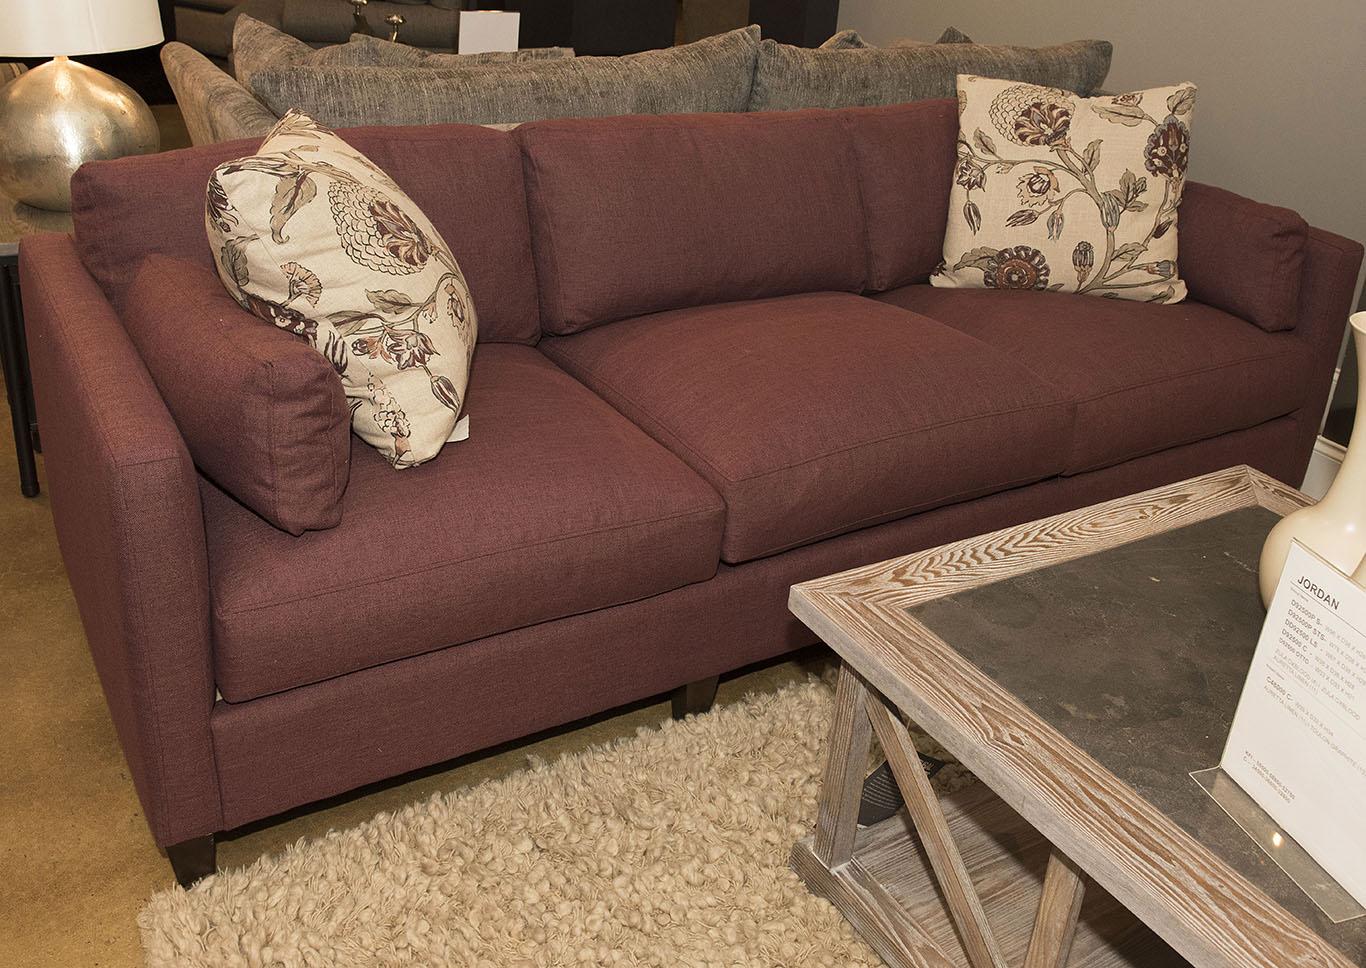 Jordan Zula Oxblood Stationary Fabric Sofa,Klaussner Home Furnishings